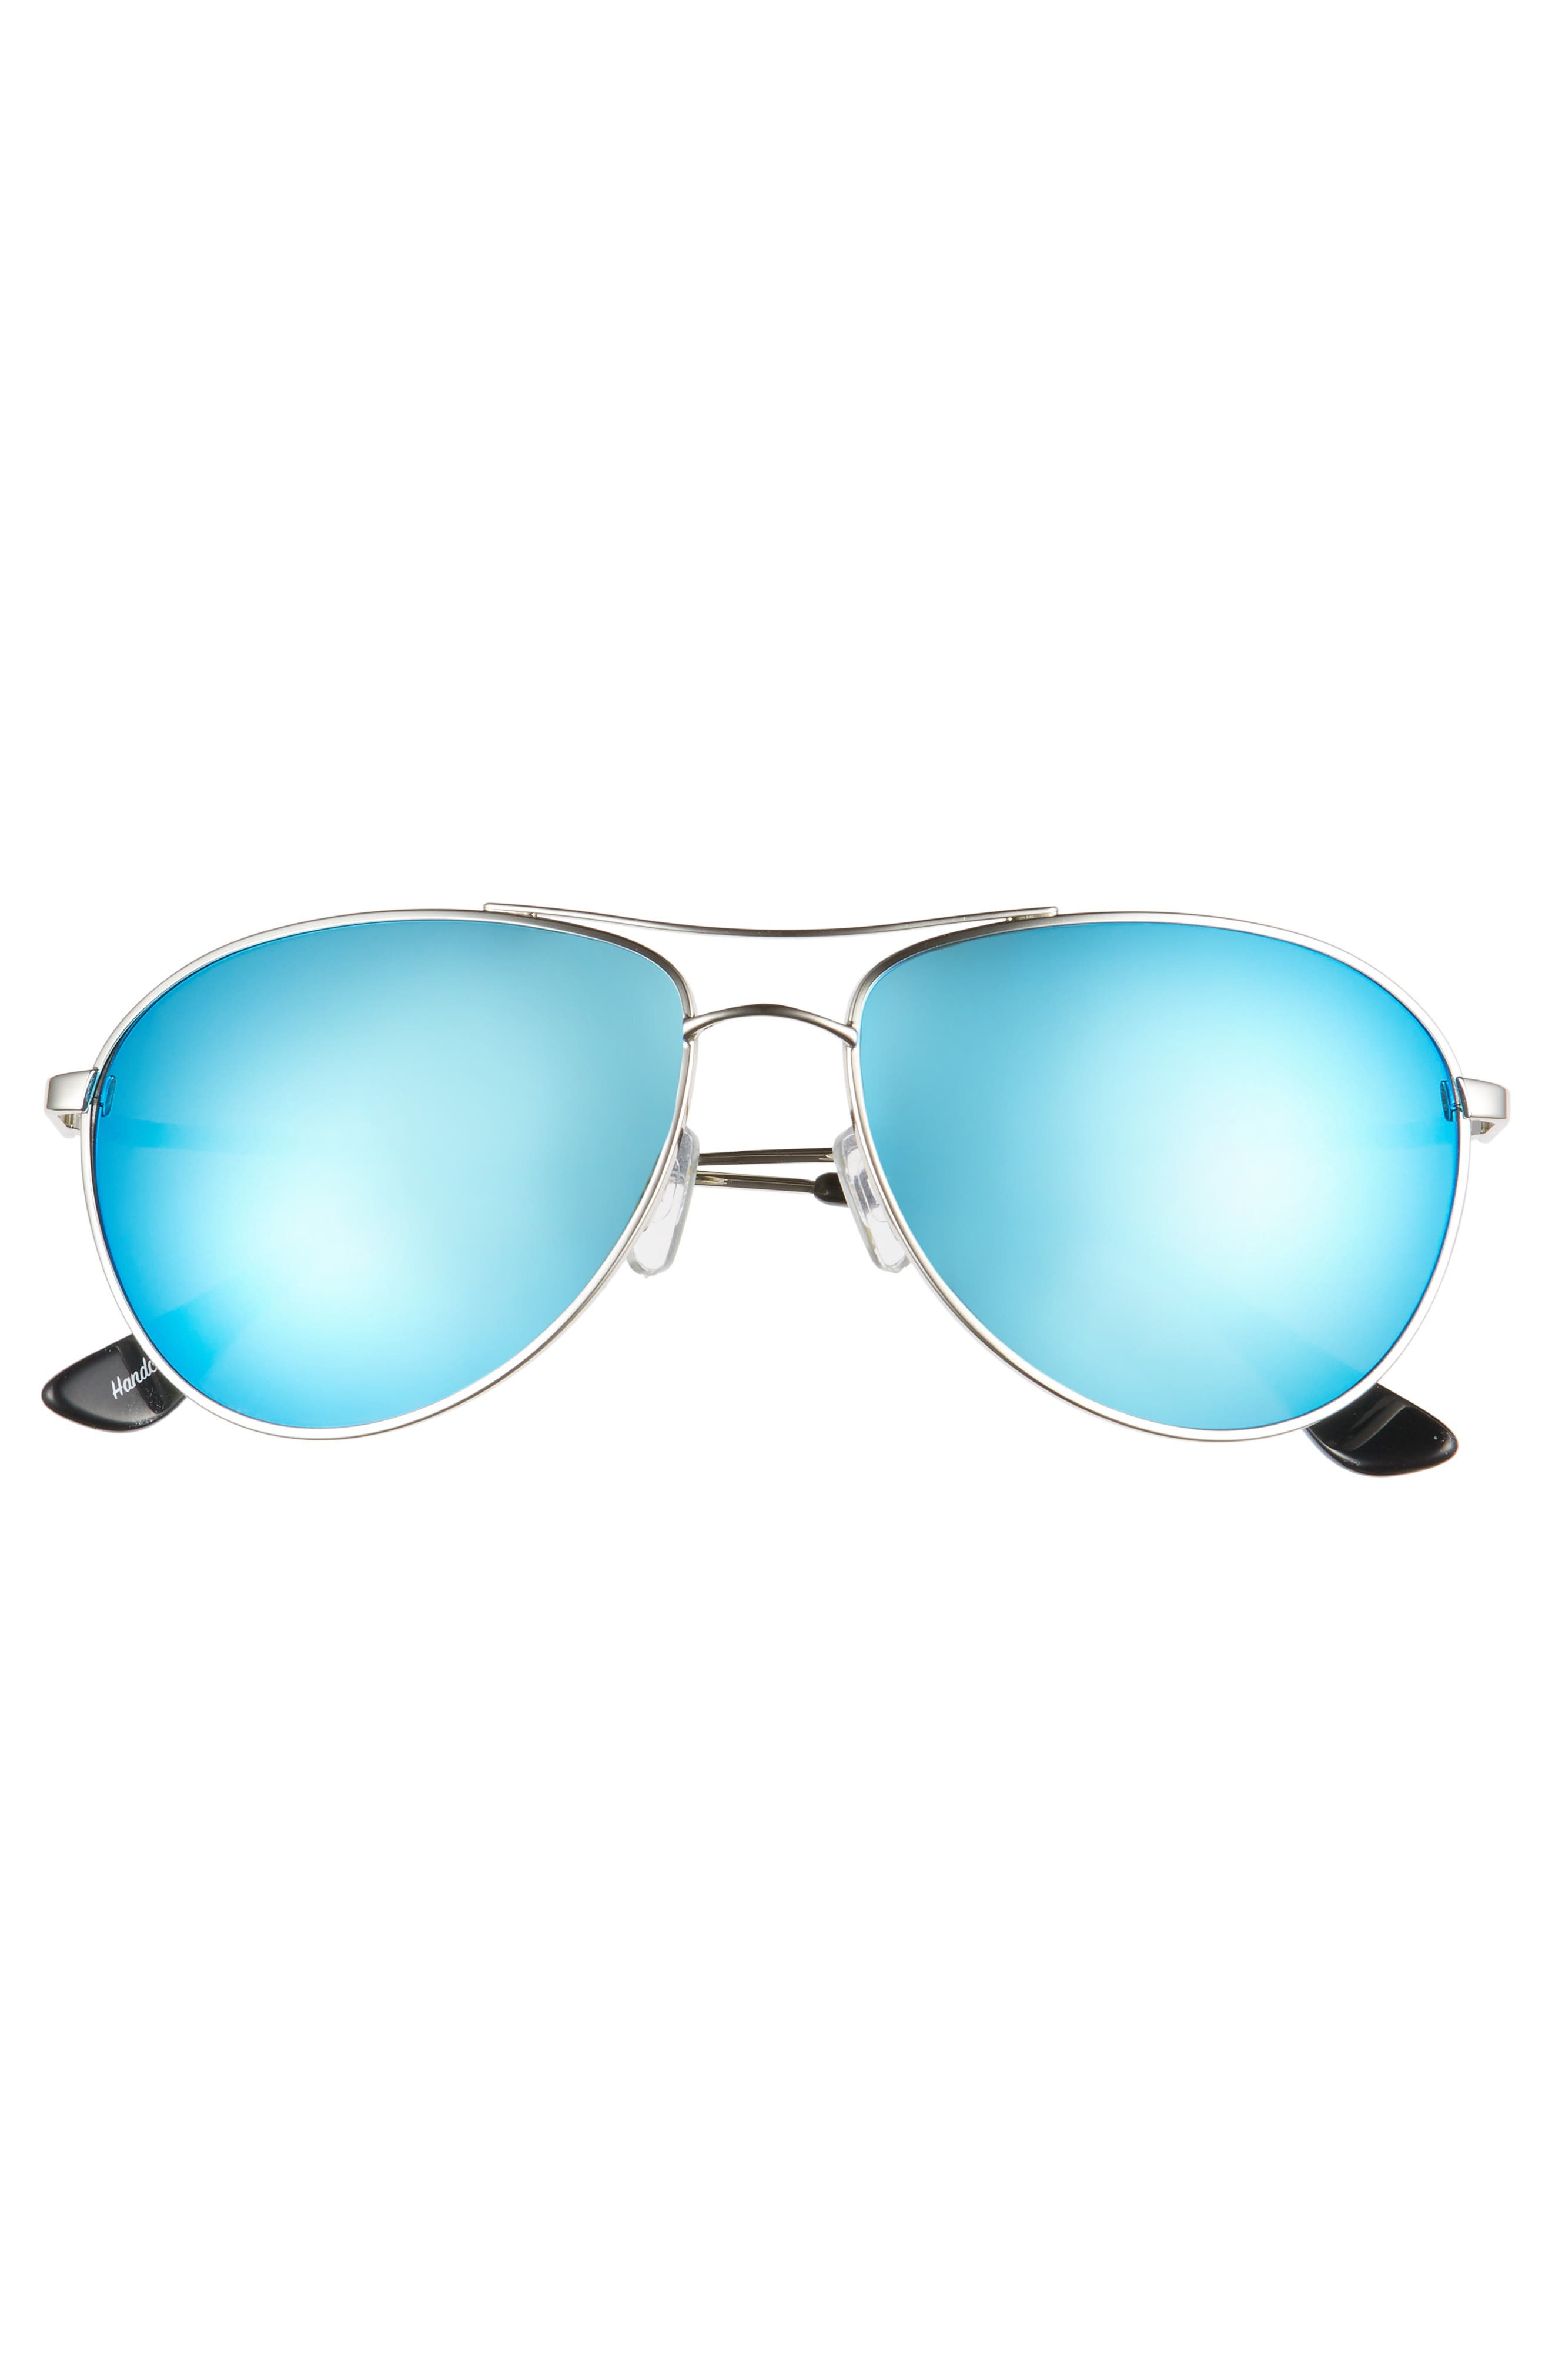 Orville 58mm Mirrored Aviator Sunglasses,                             Alternate thumbnail 3, color,                             Silver/ Blue Mirror